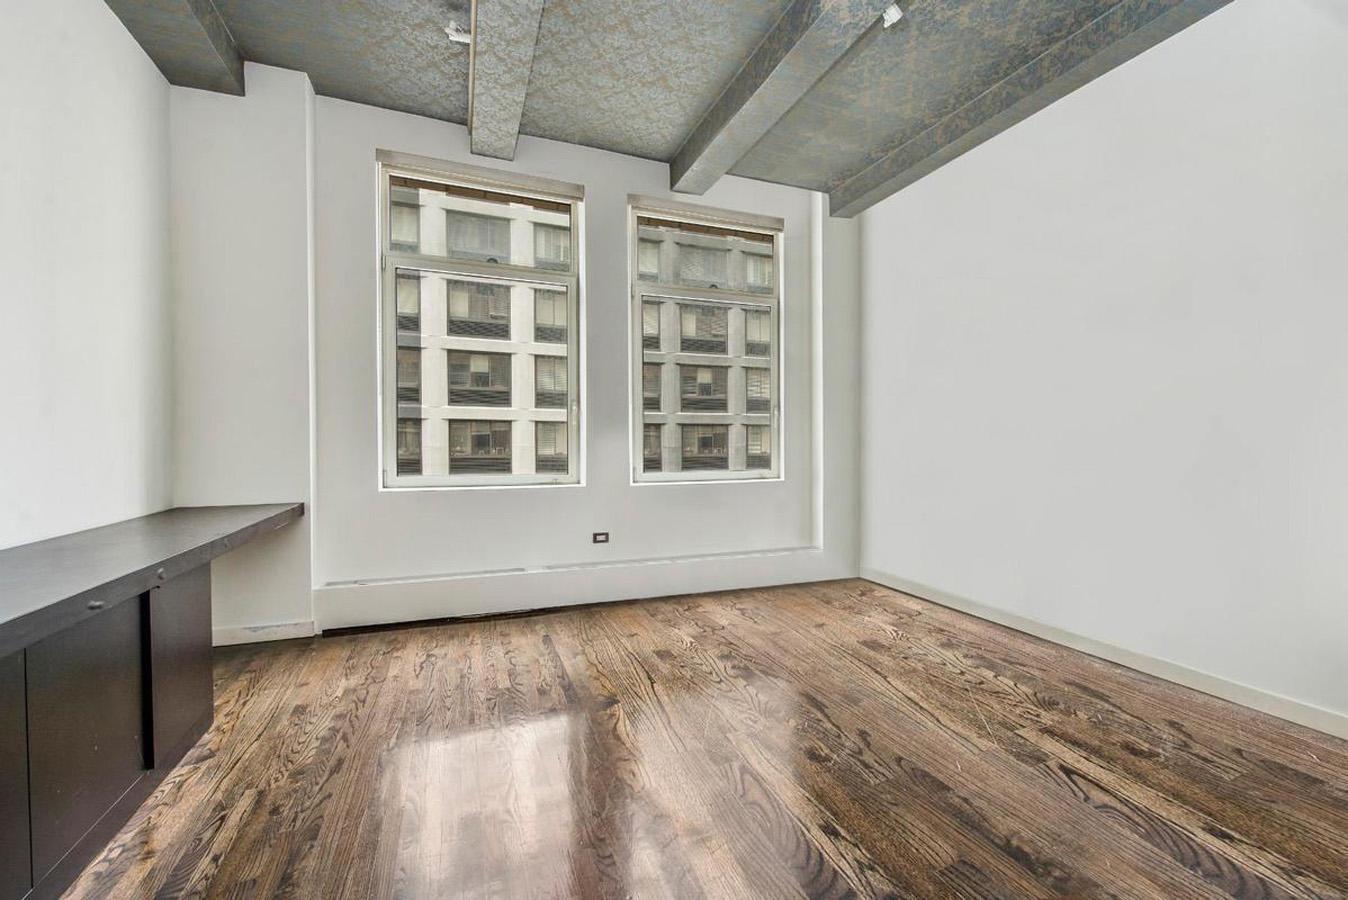 Chelsea Atelier, 245 Seventh Avenue